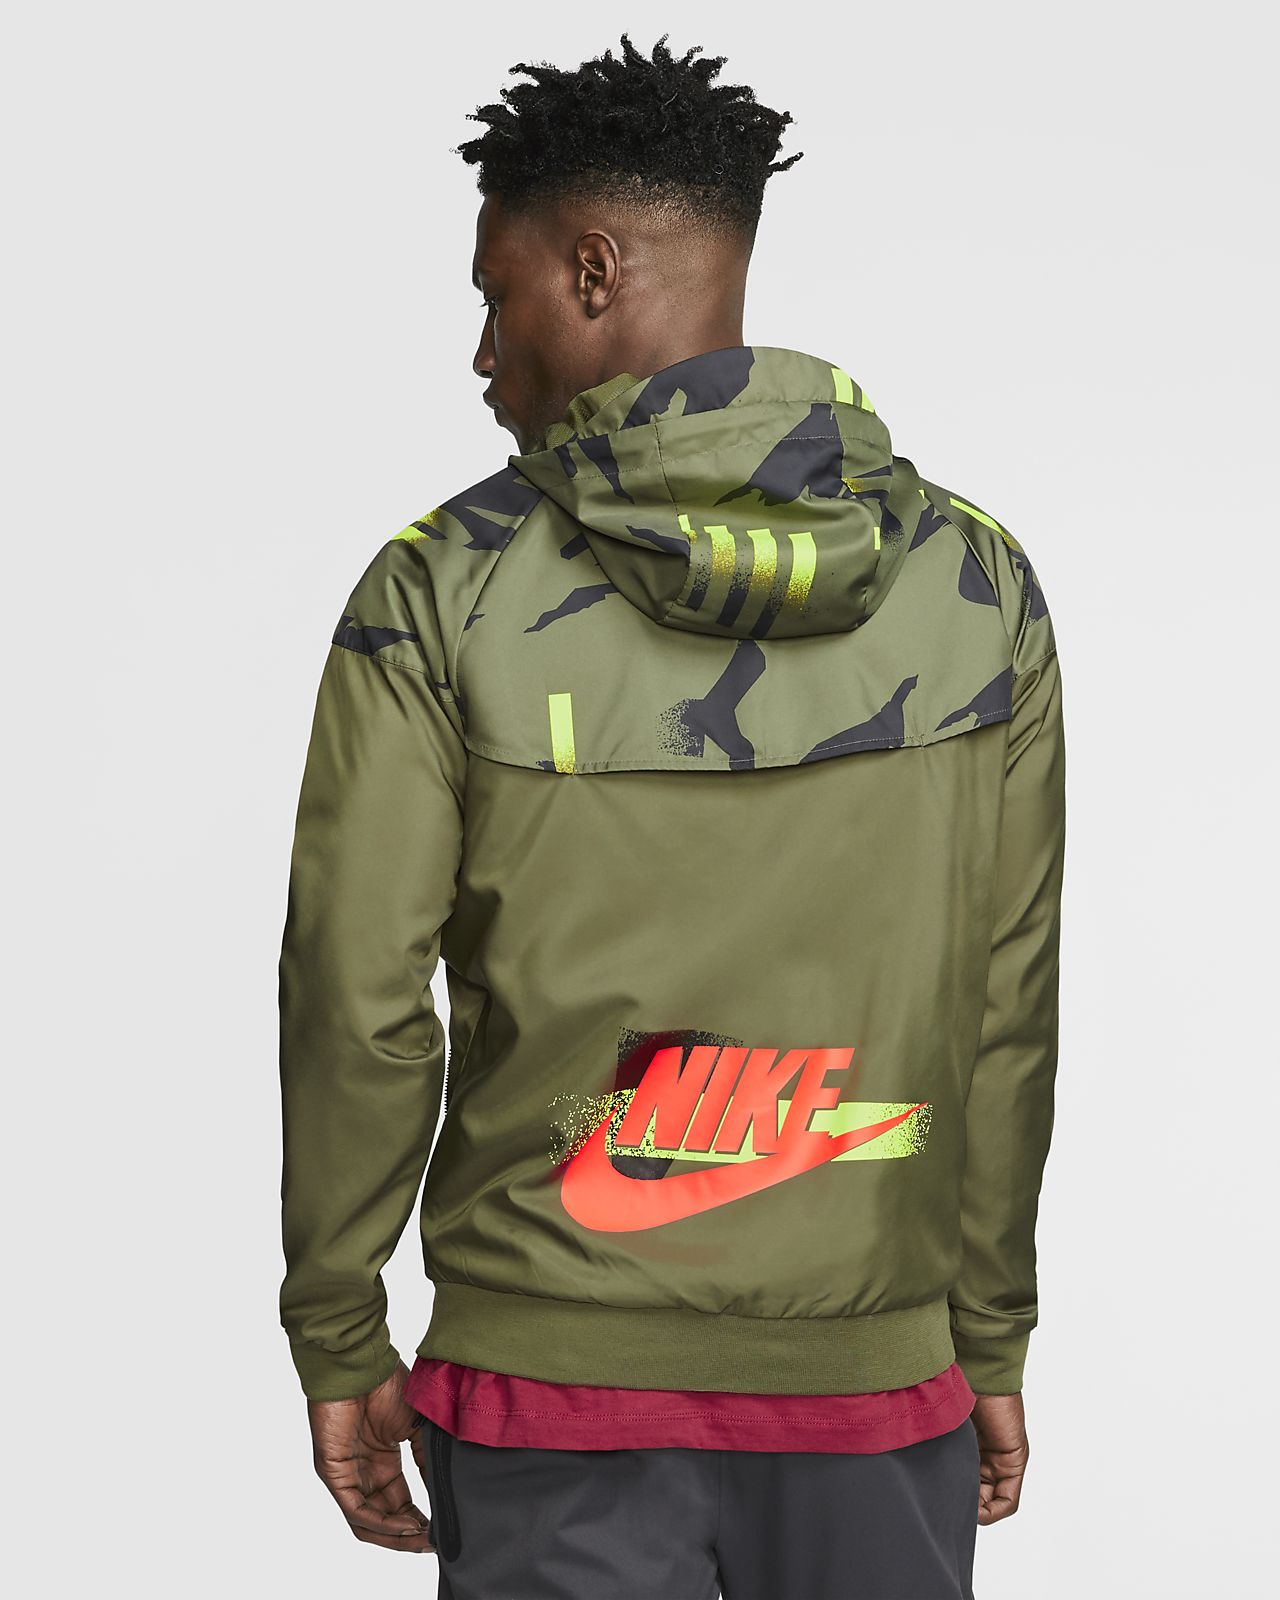 8cbdd8a3b50 Nike Sportswear Windrunner-jakke til mænd. Nike.com DK